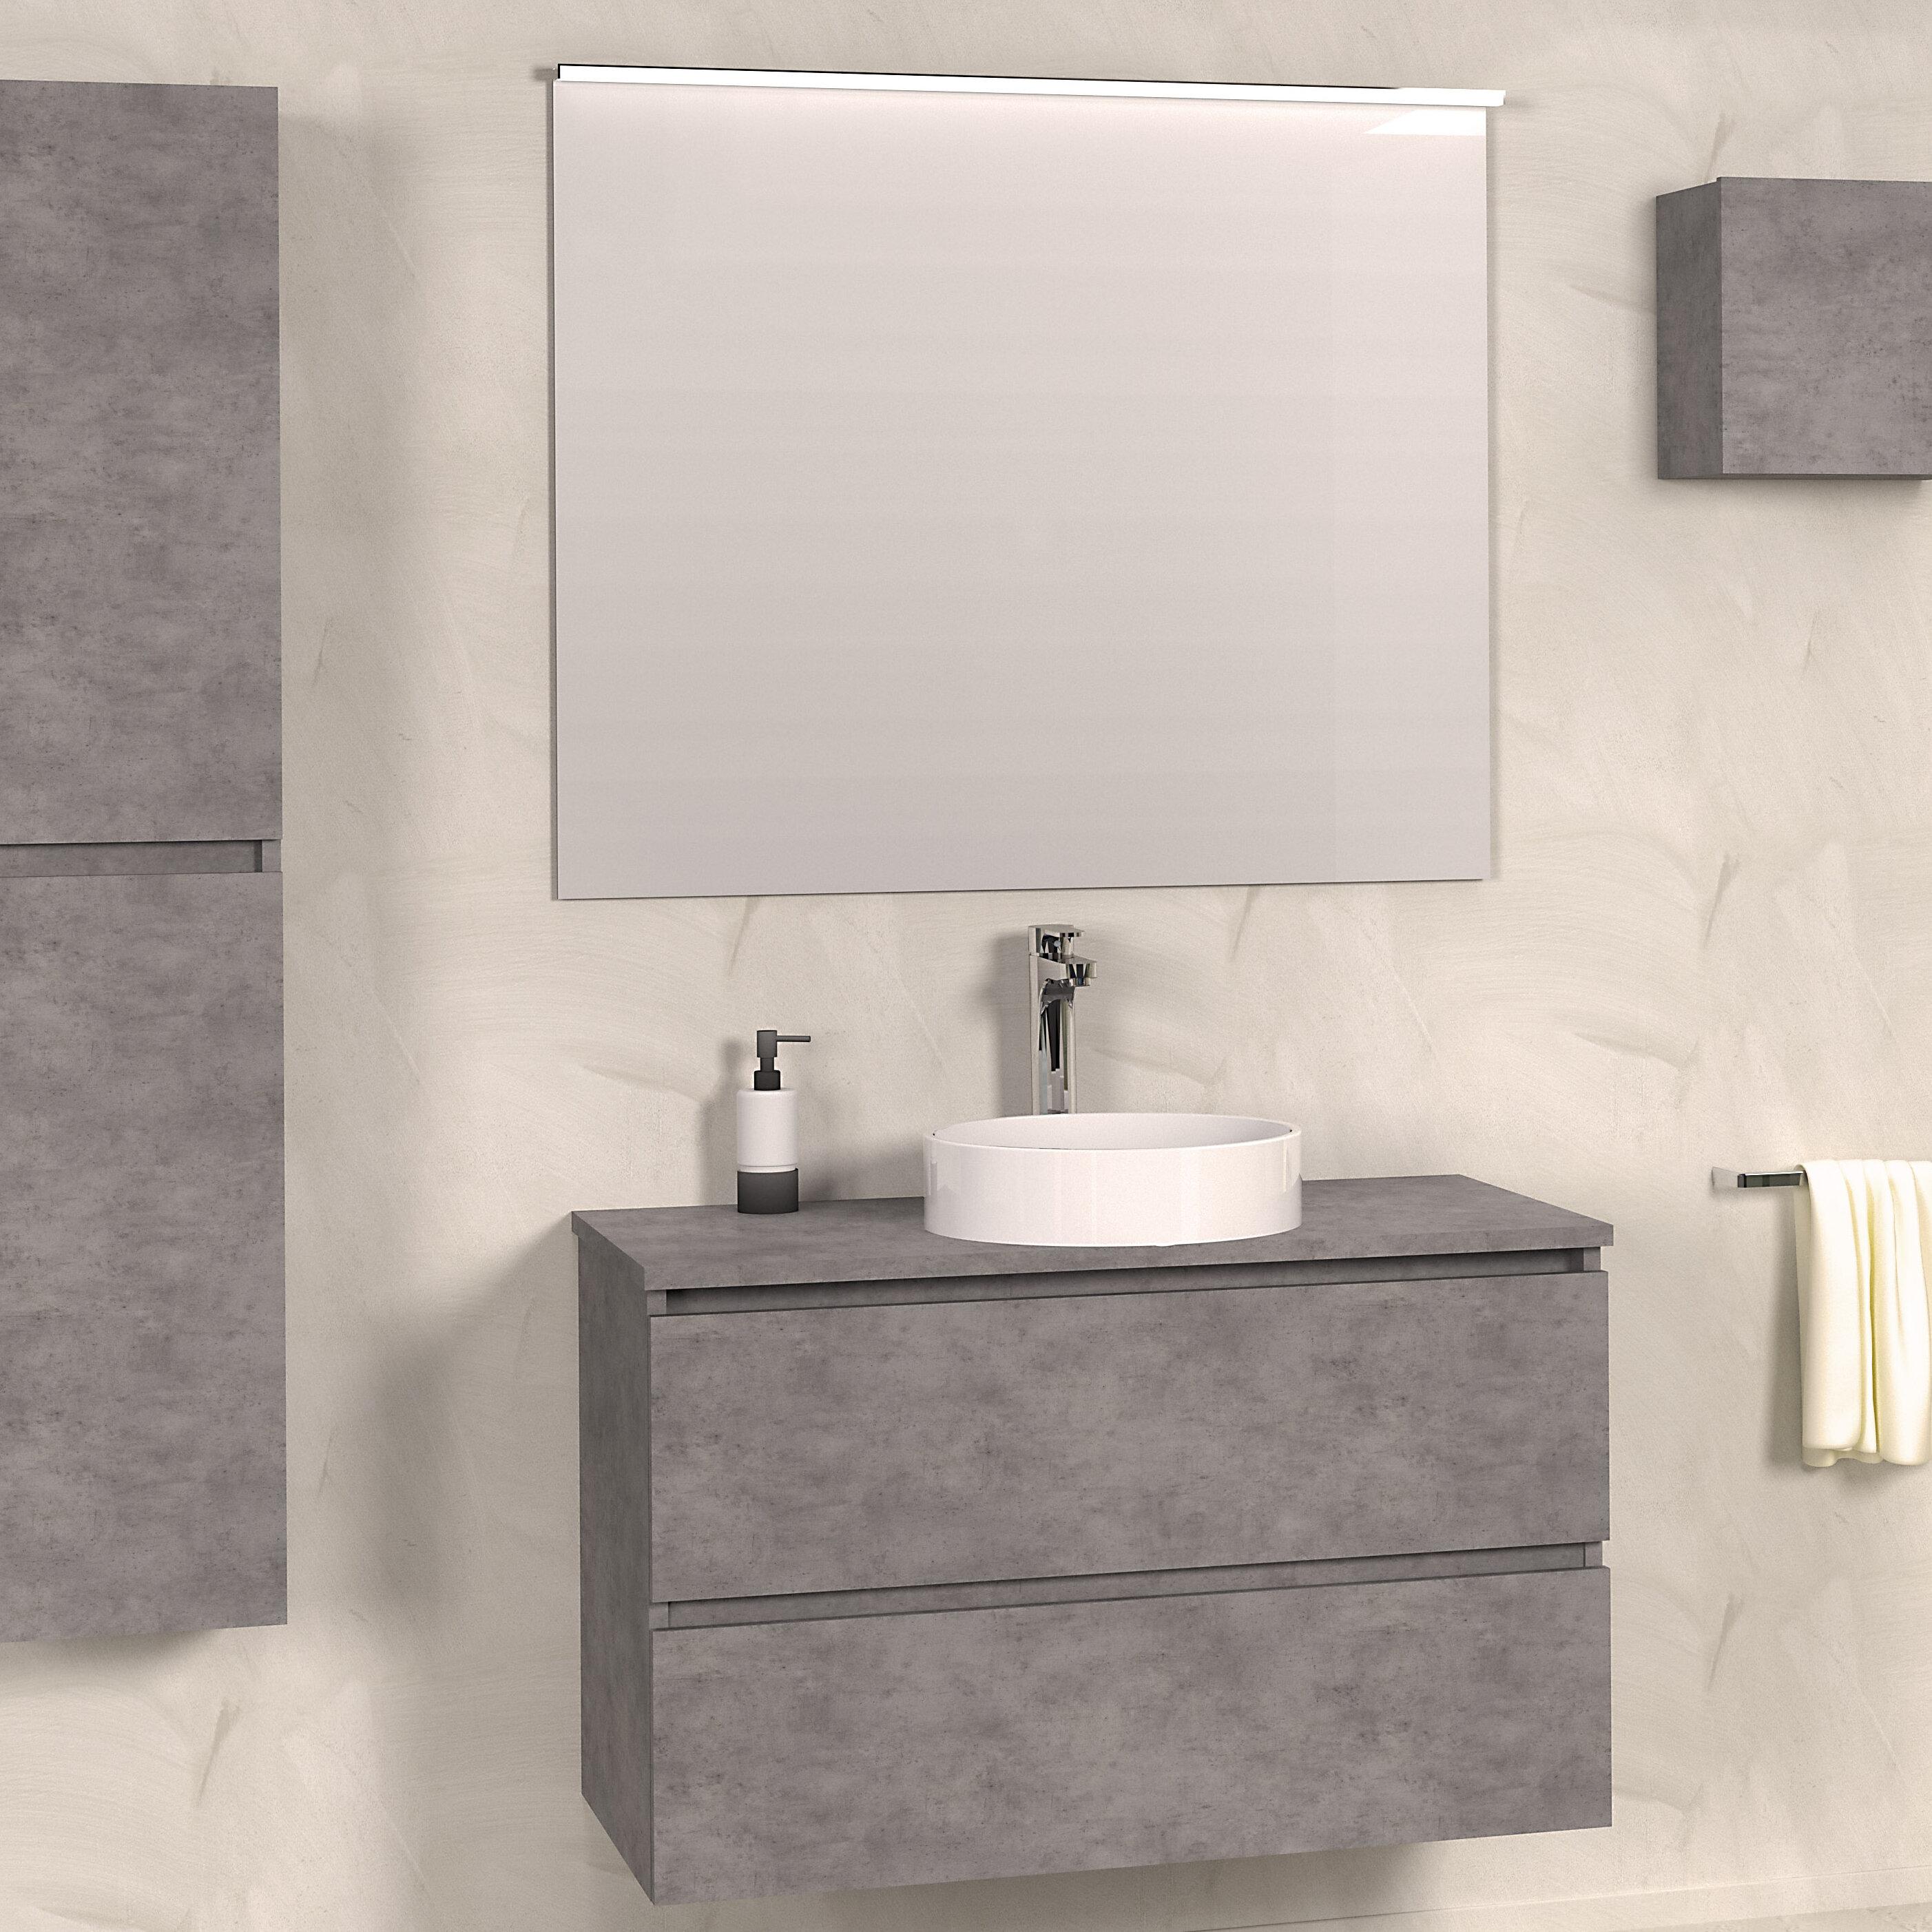 Bathroom 9mm Wall Hung Single Vanity Unit